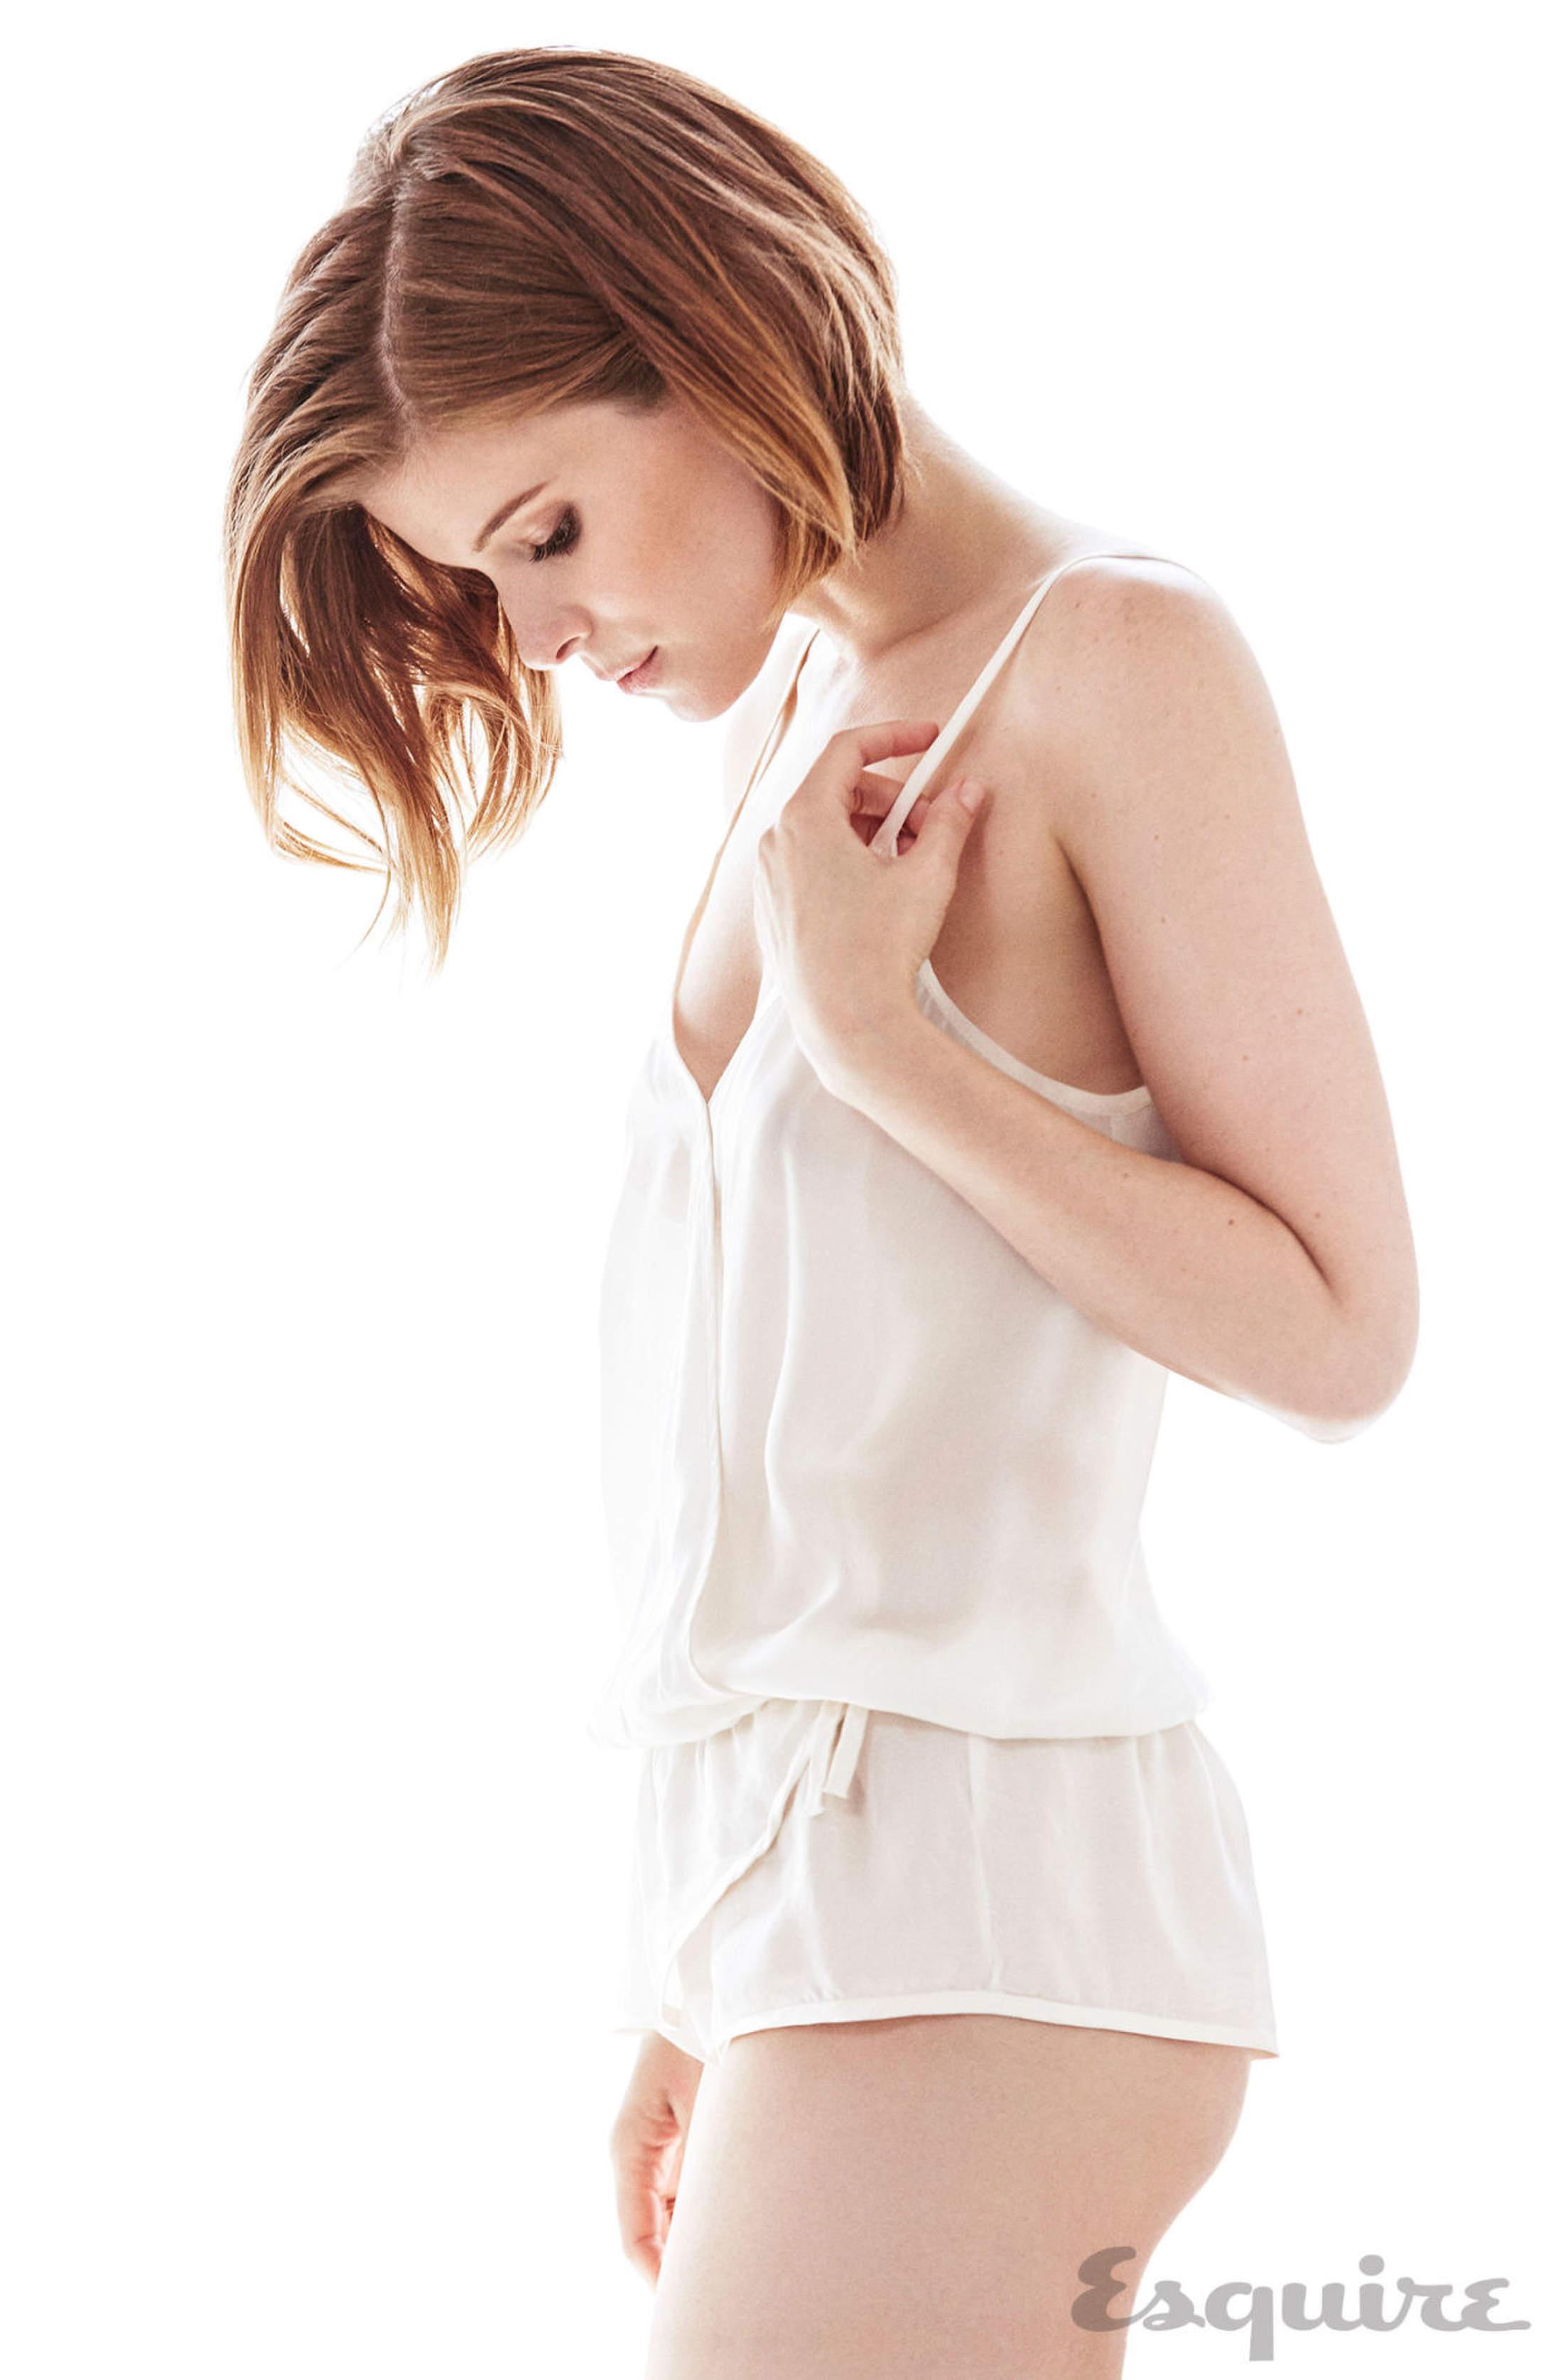 Kate Mara hottest photo